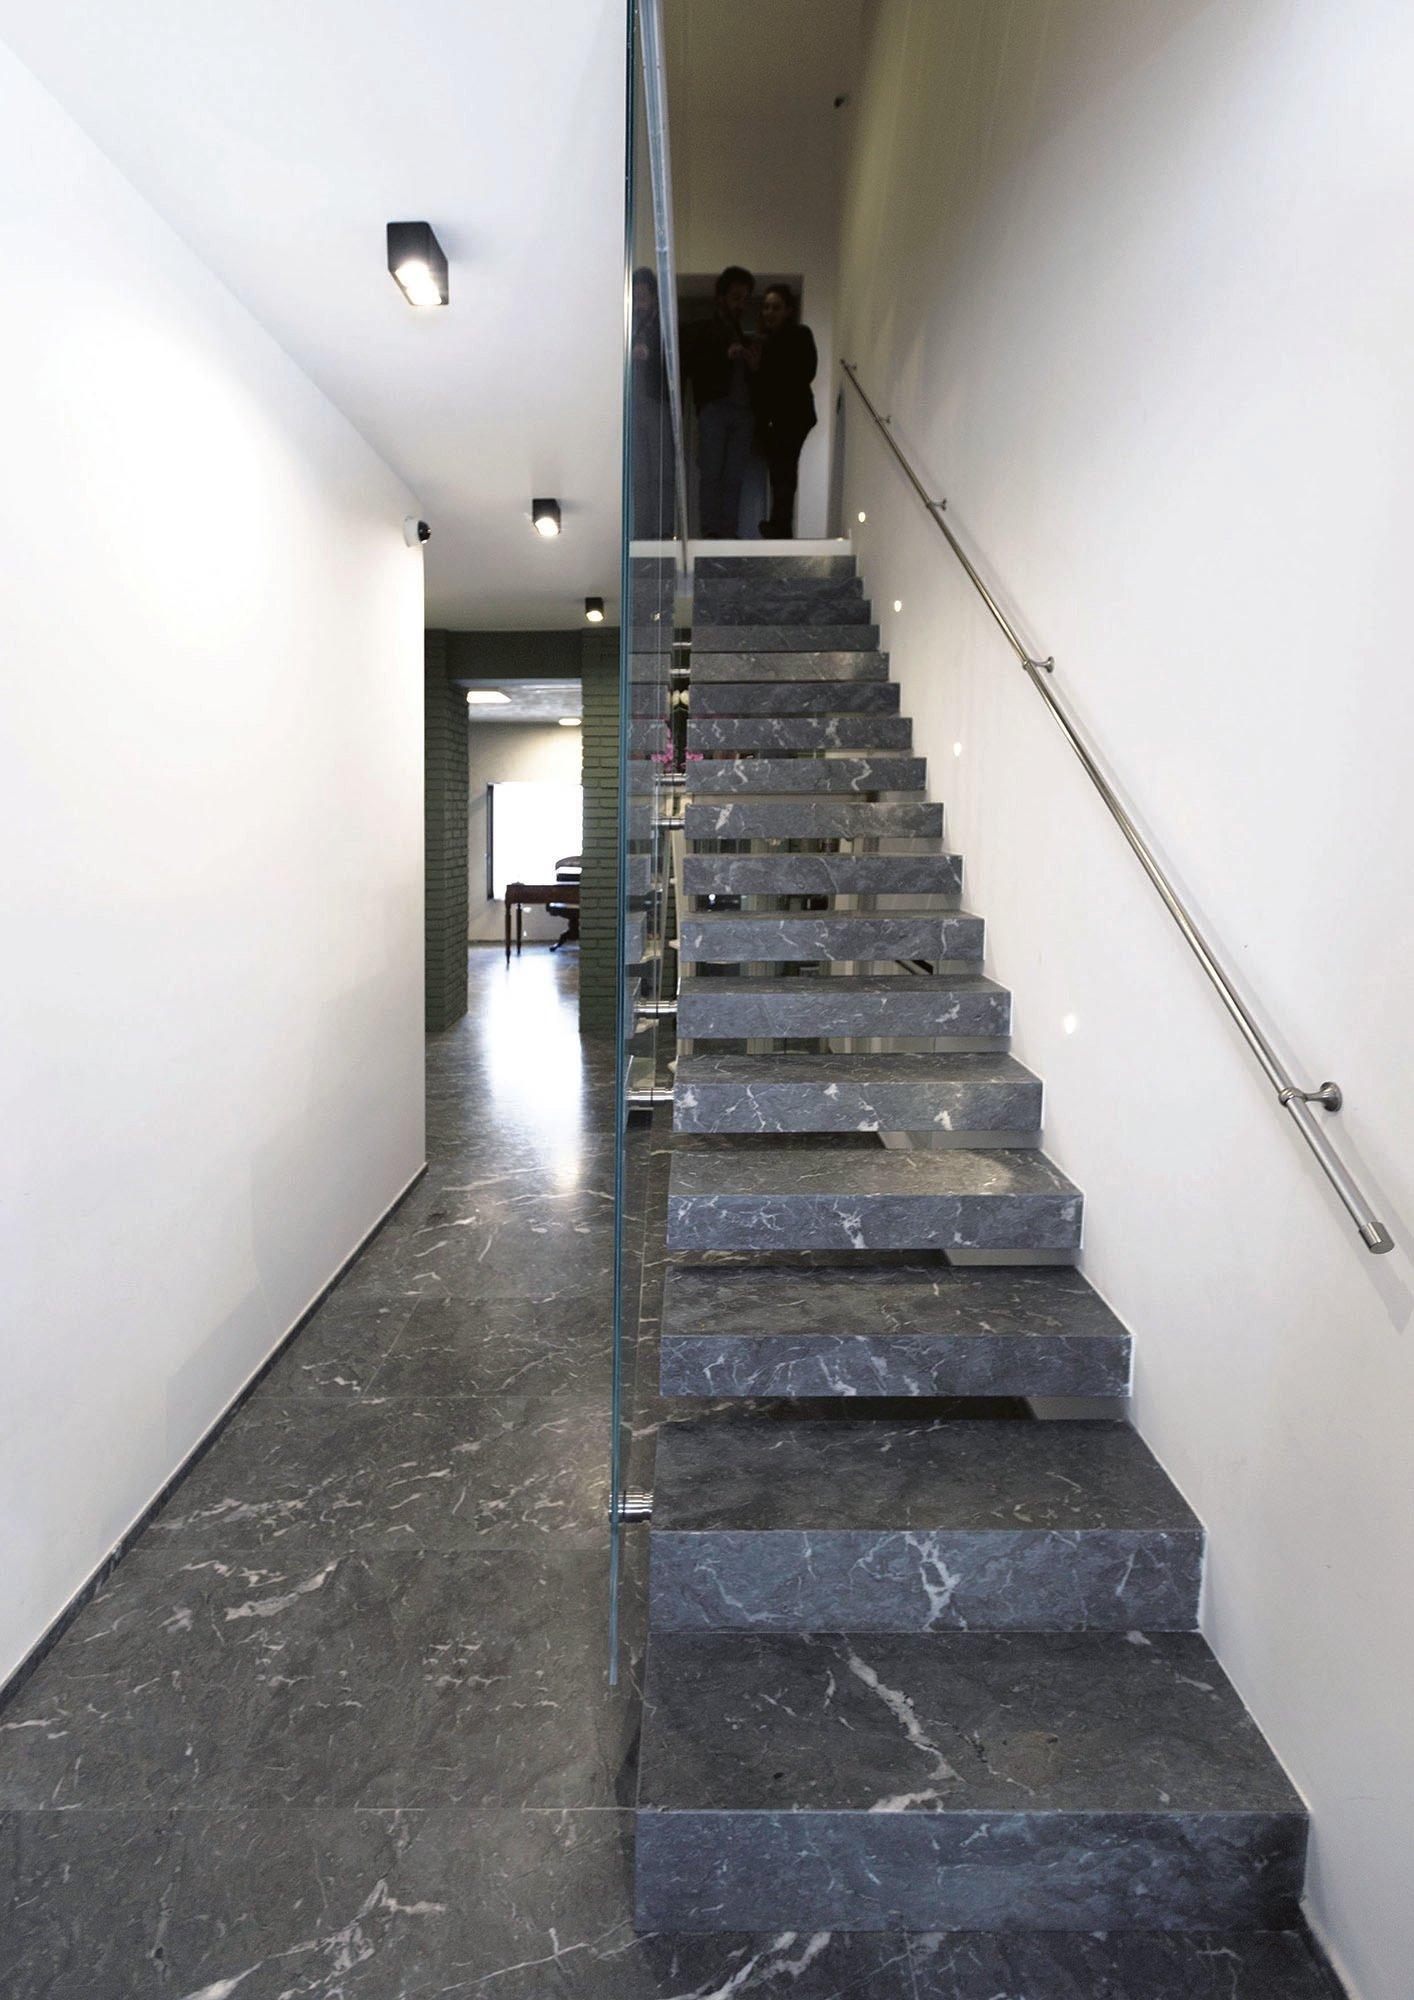 Scala interna – Internal staircase